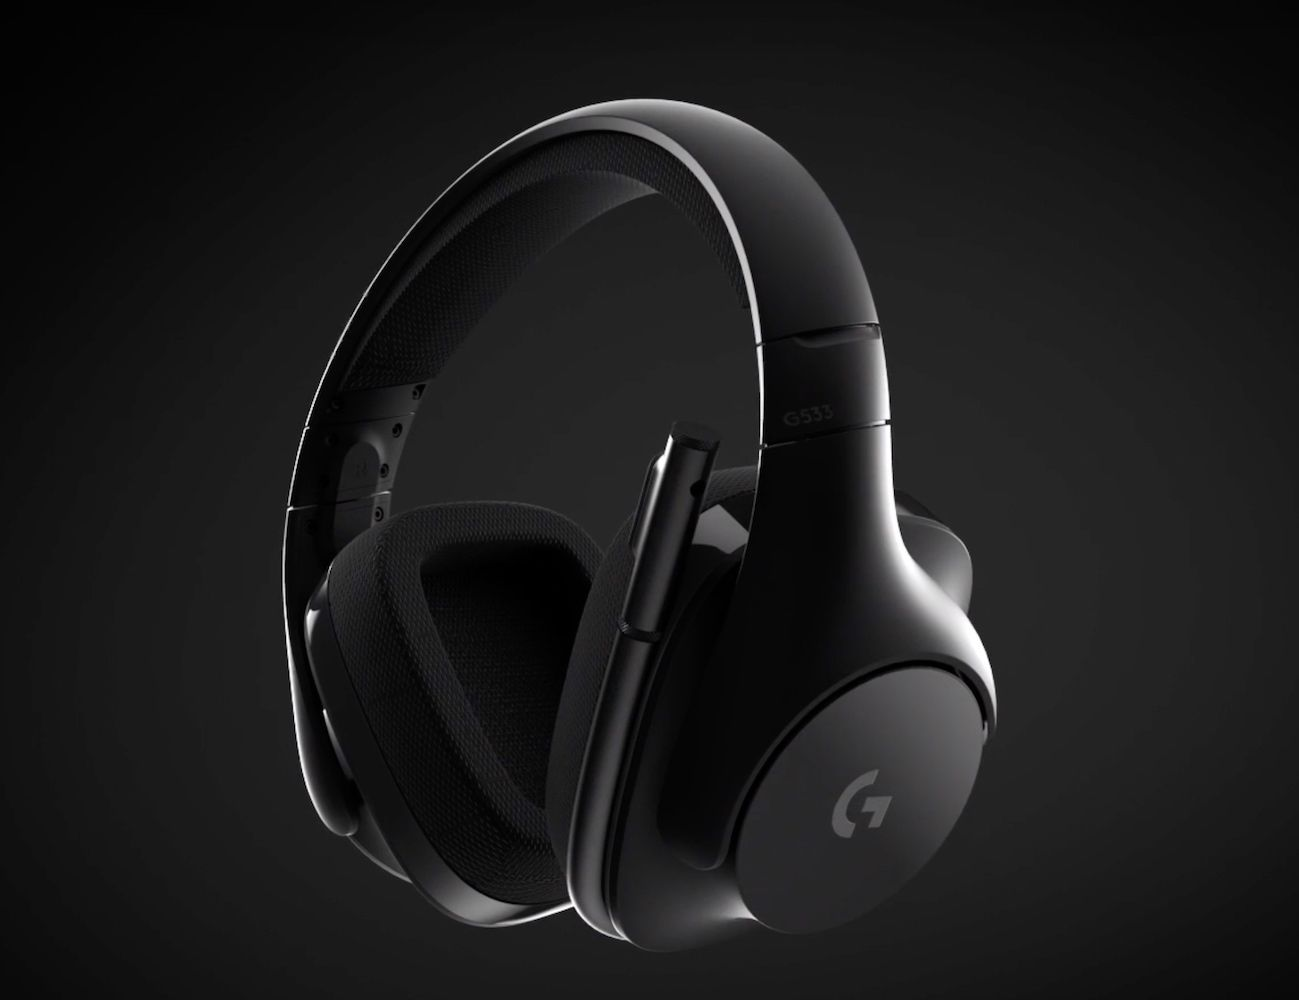 Logitech G533 Wireless Gaming Headset Dts 7 1 Surround Sound Pro G Audio Drivers Wireless Gaming Headset Best Gaming Headset Headset